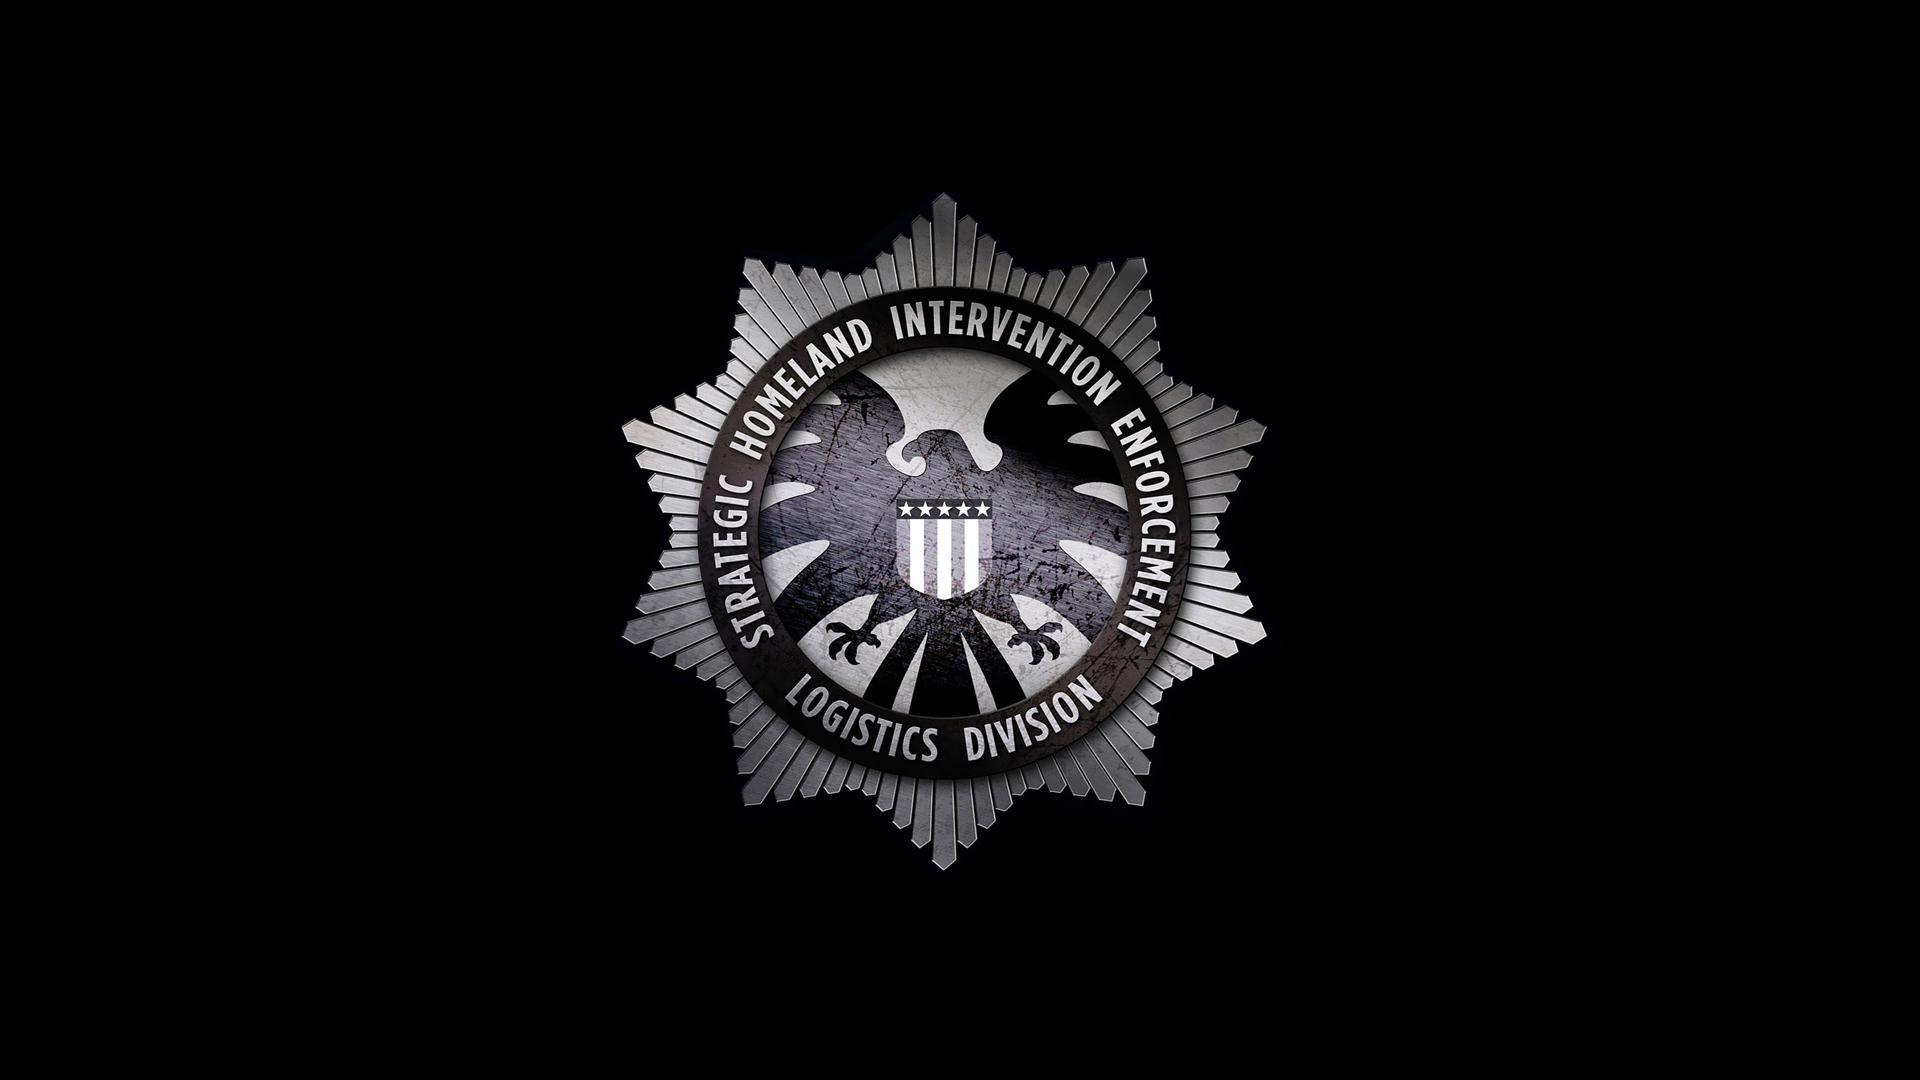 agents of shield wallpapers hd wallpapersafari